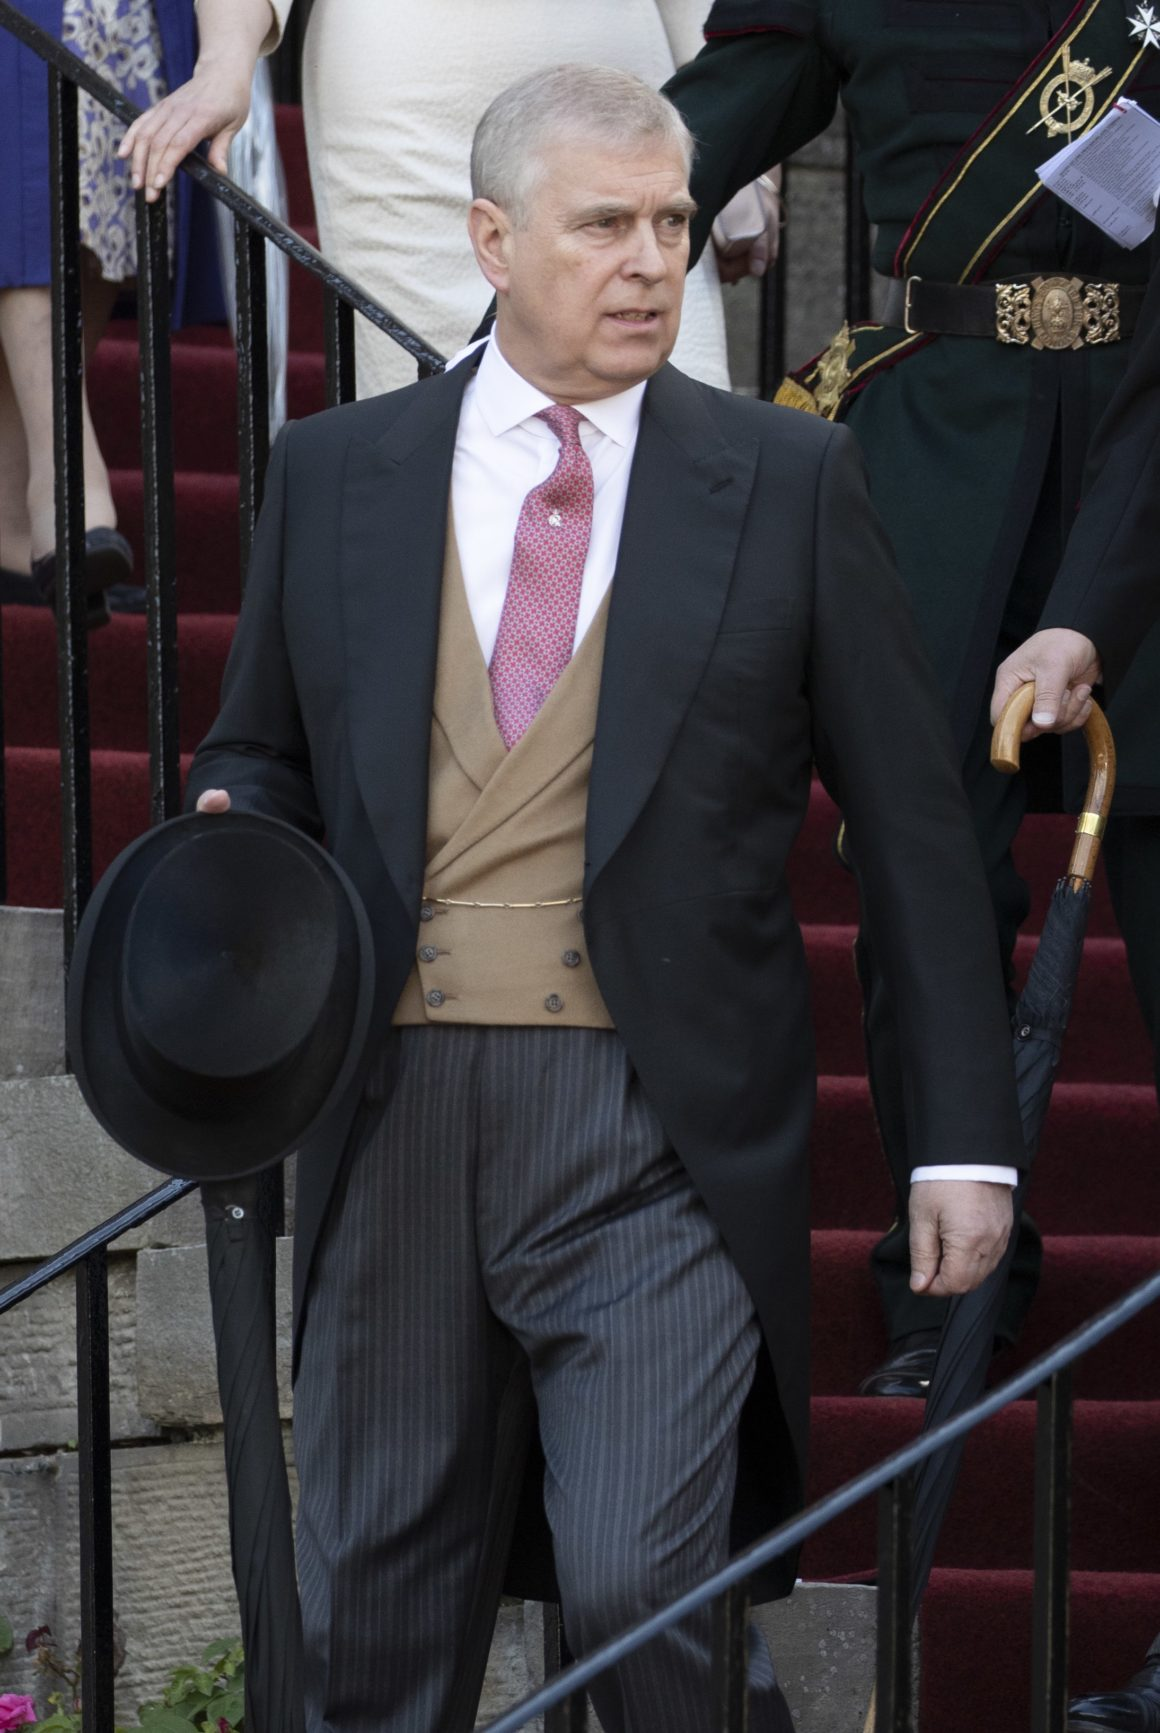 Prince Andrew S Jeffrey Epstein Interview Was A Pr Disaster